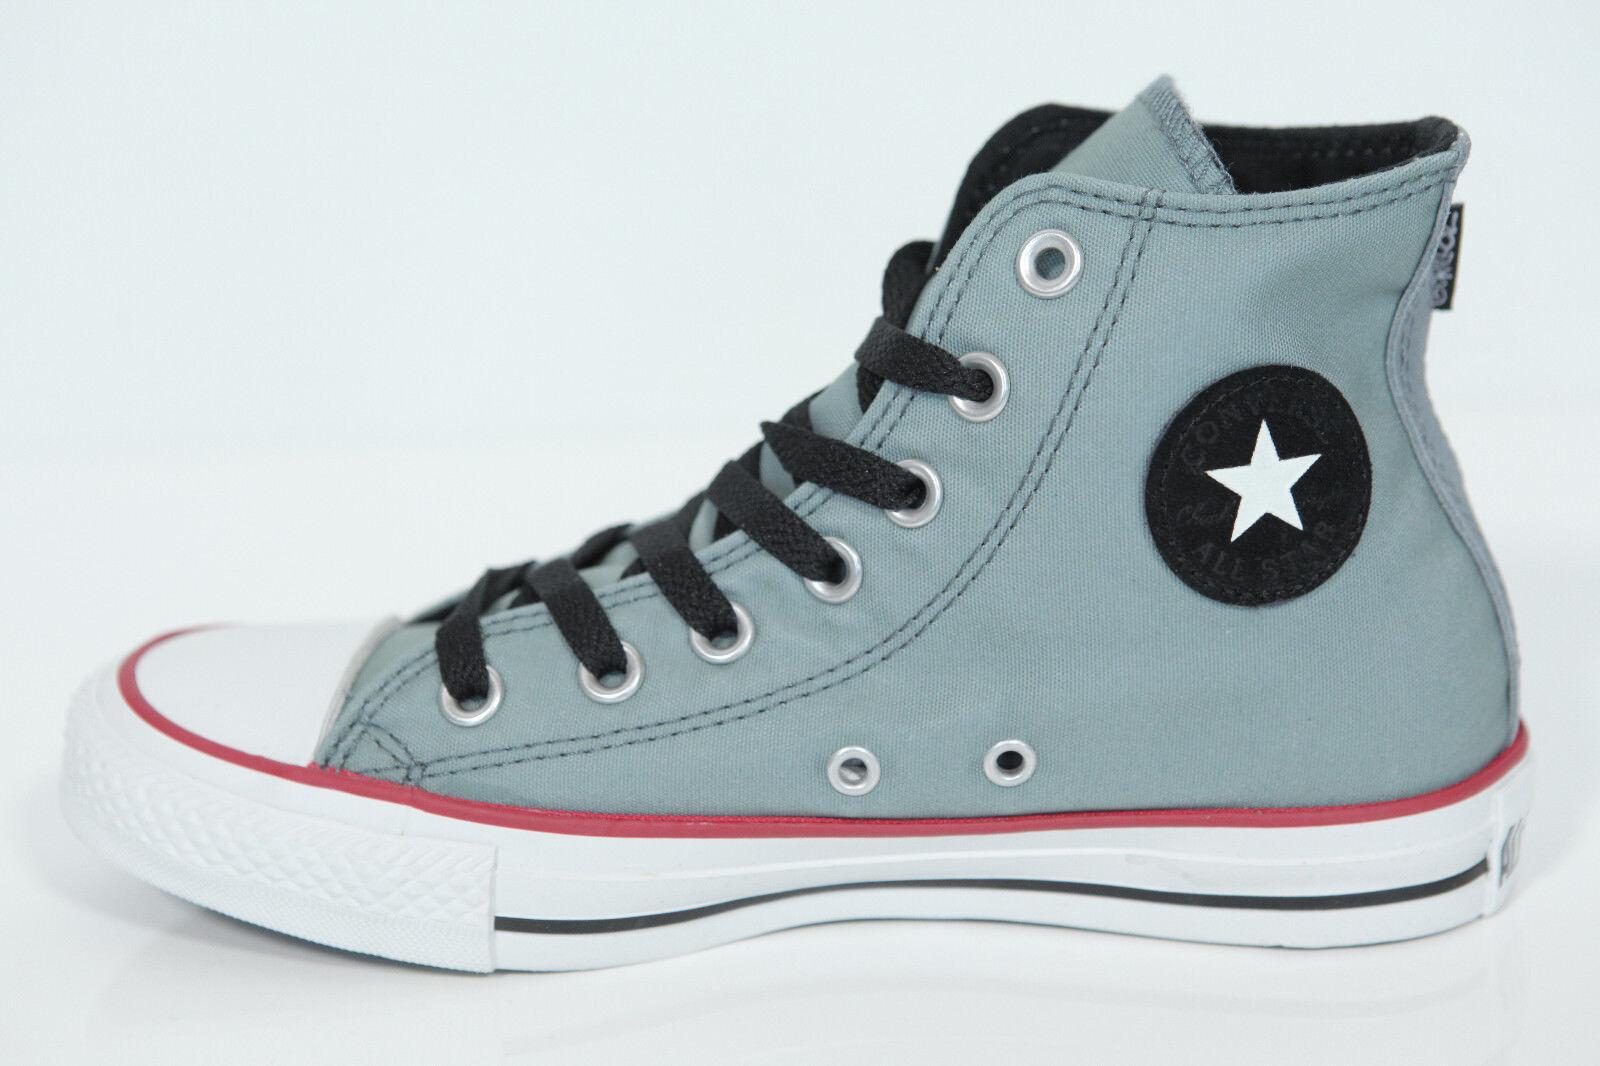 Neuf All All All Star Converse Chucks Sneaker Chaussures Culte 132177c Ct Hi 85a33a